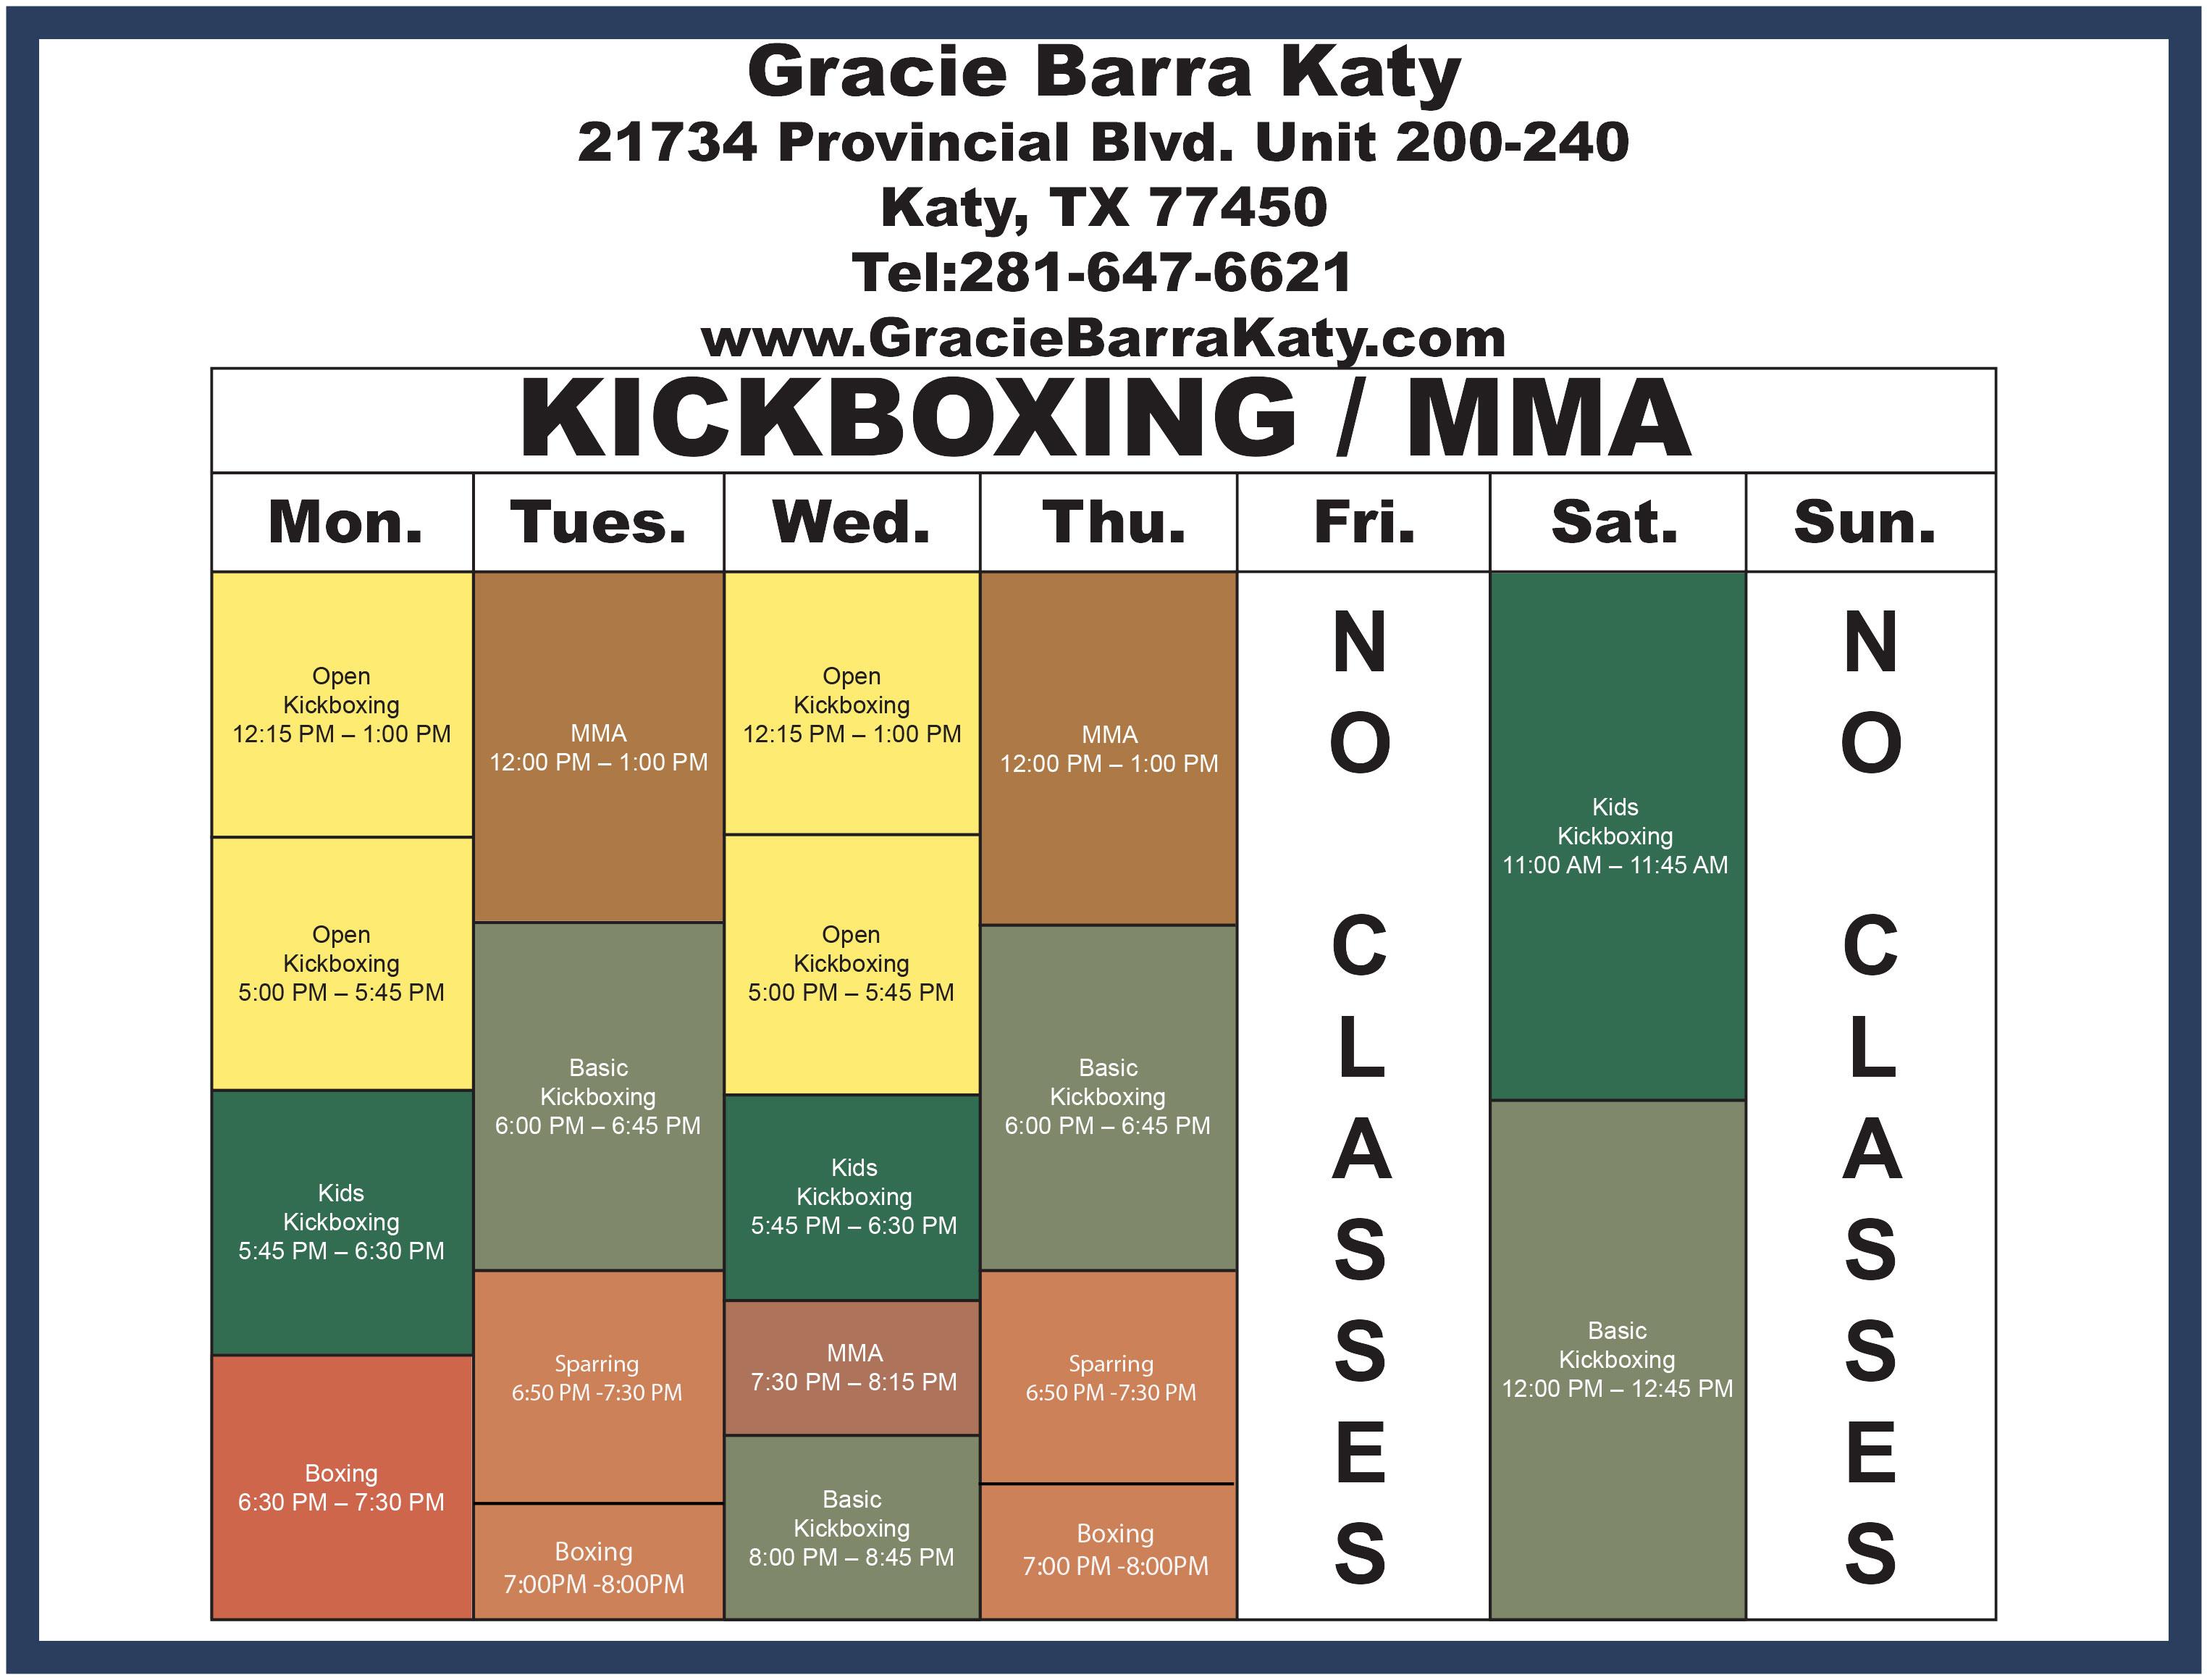 Gracie Barra Katy Schedule